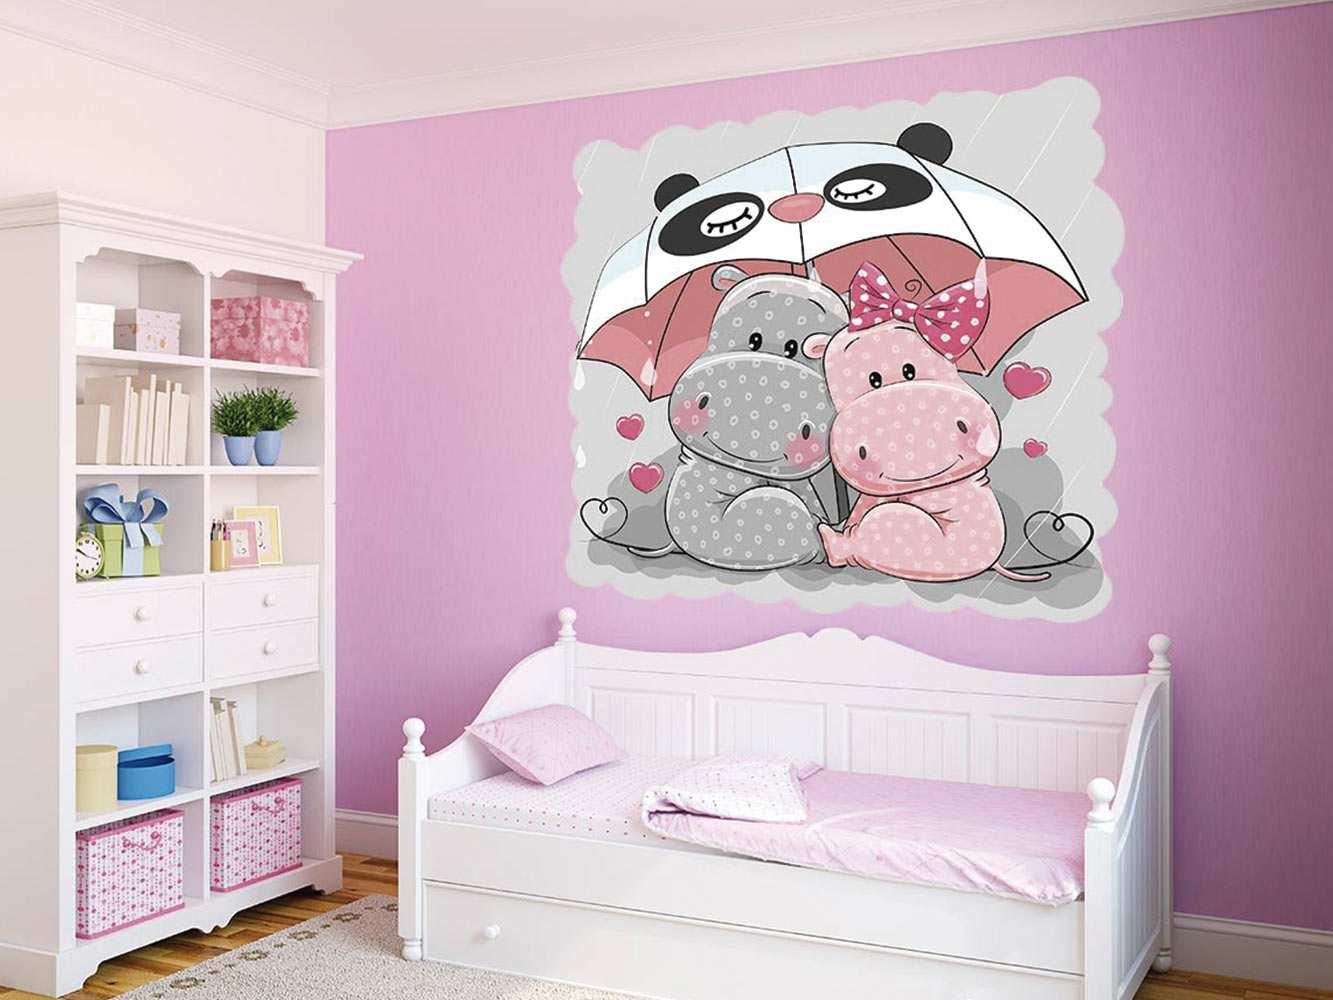 Vinilo Infantil Hipopotamos Paraguas | Carteles XXL - Impresión carteleria publicitaria